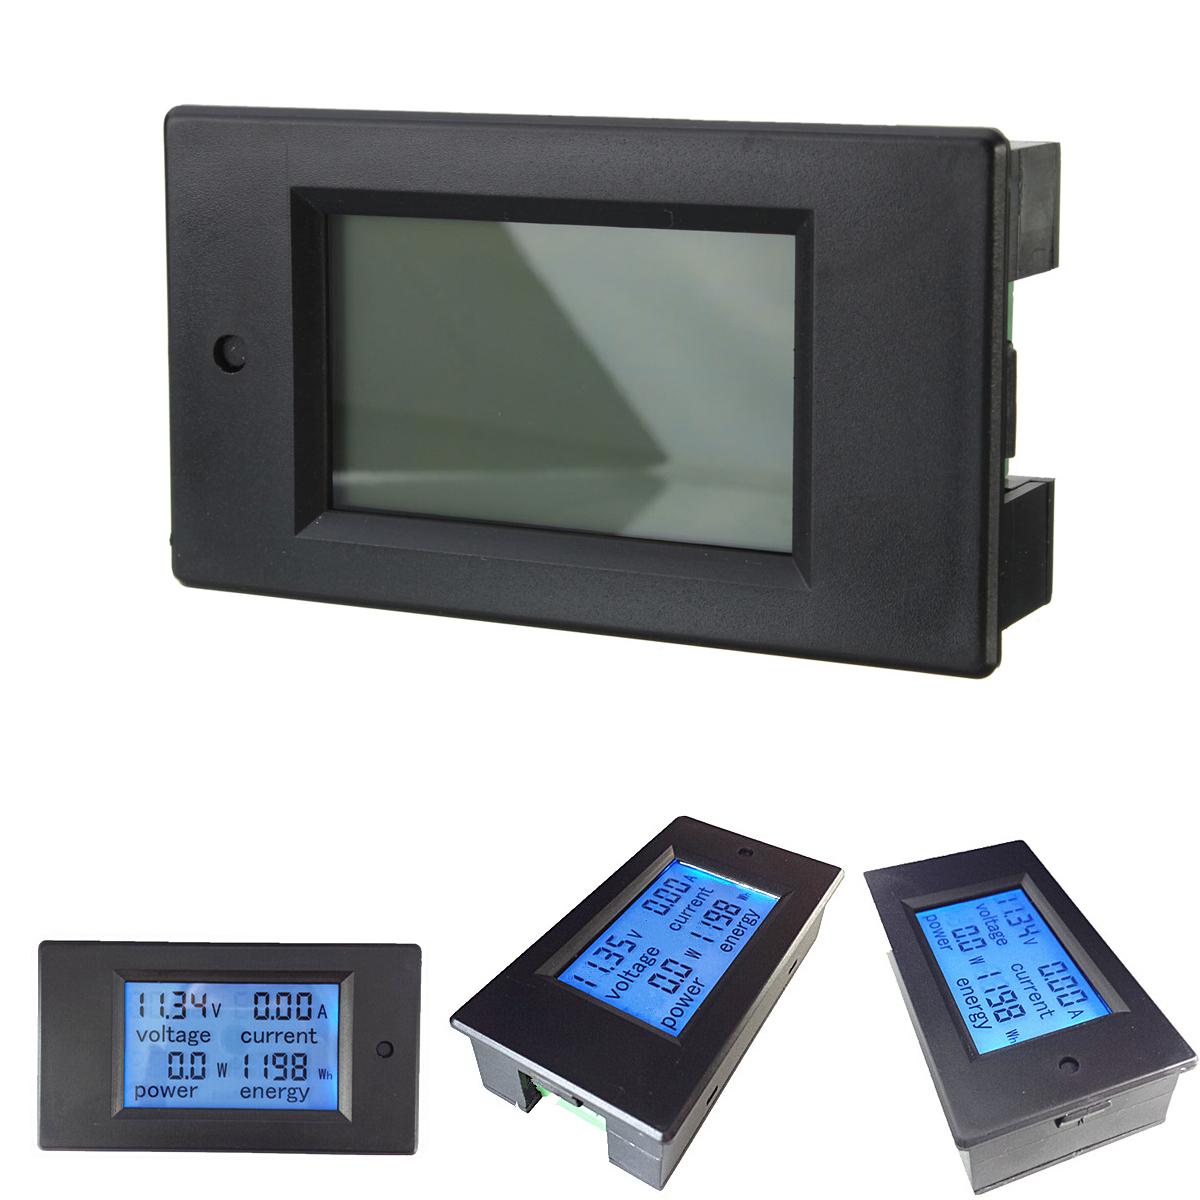 Digital Power Monitor : Dc a ammeter tester digital led power meter monitor